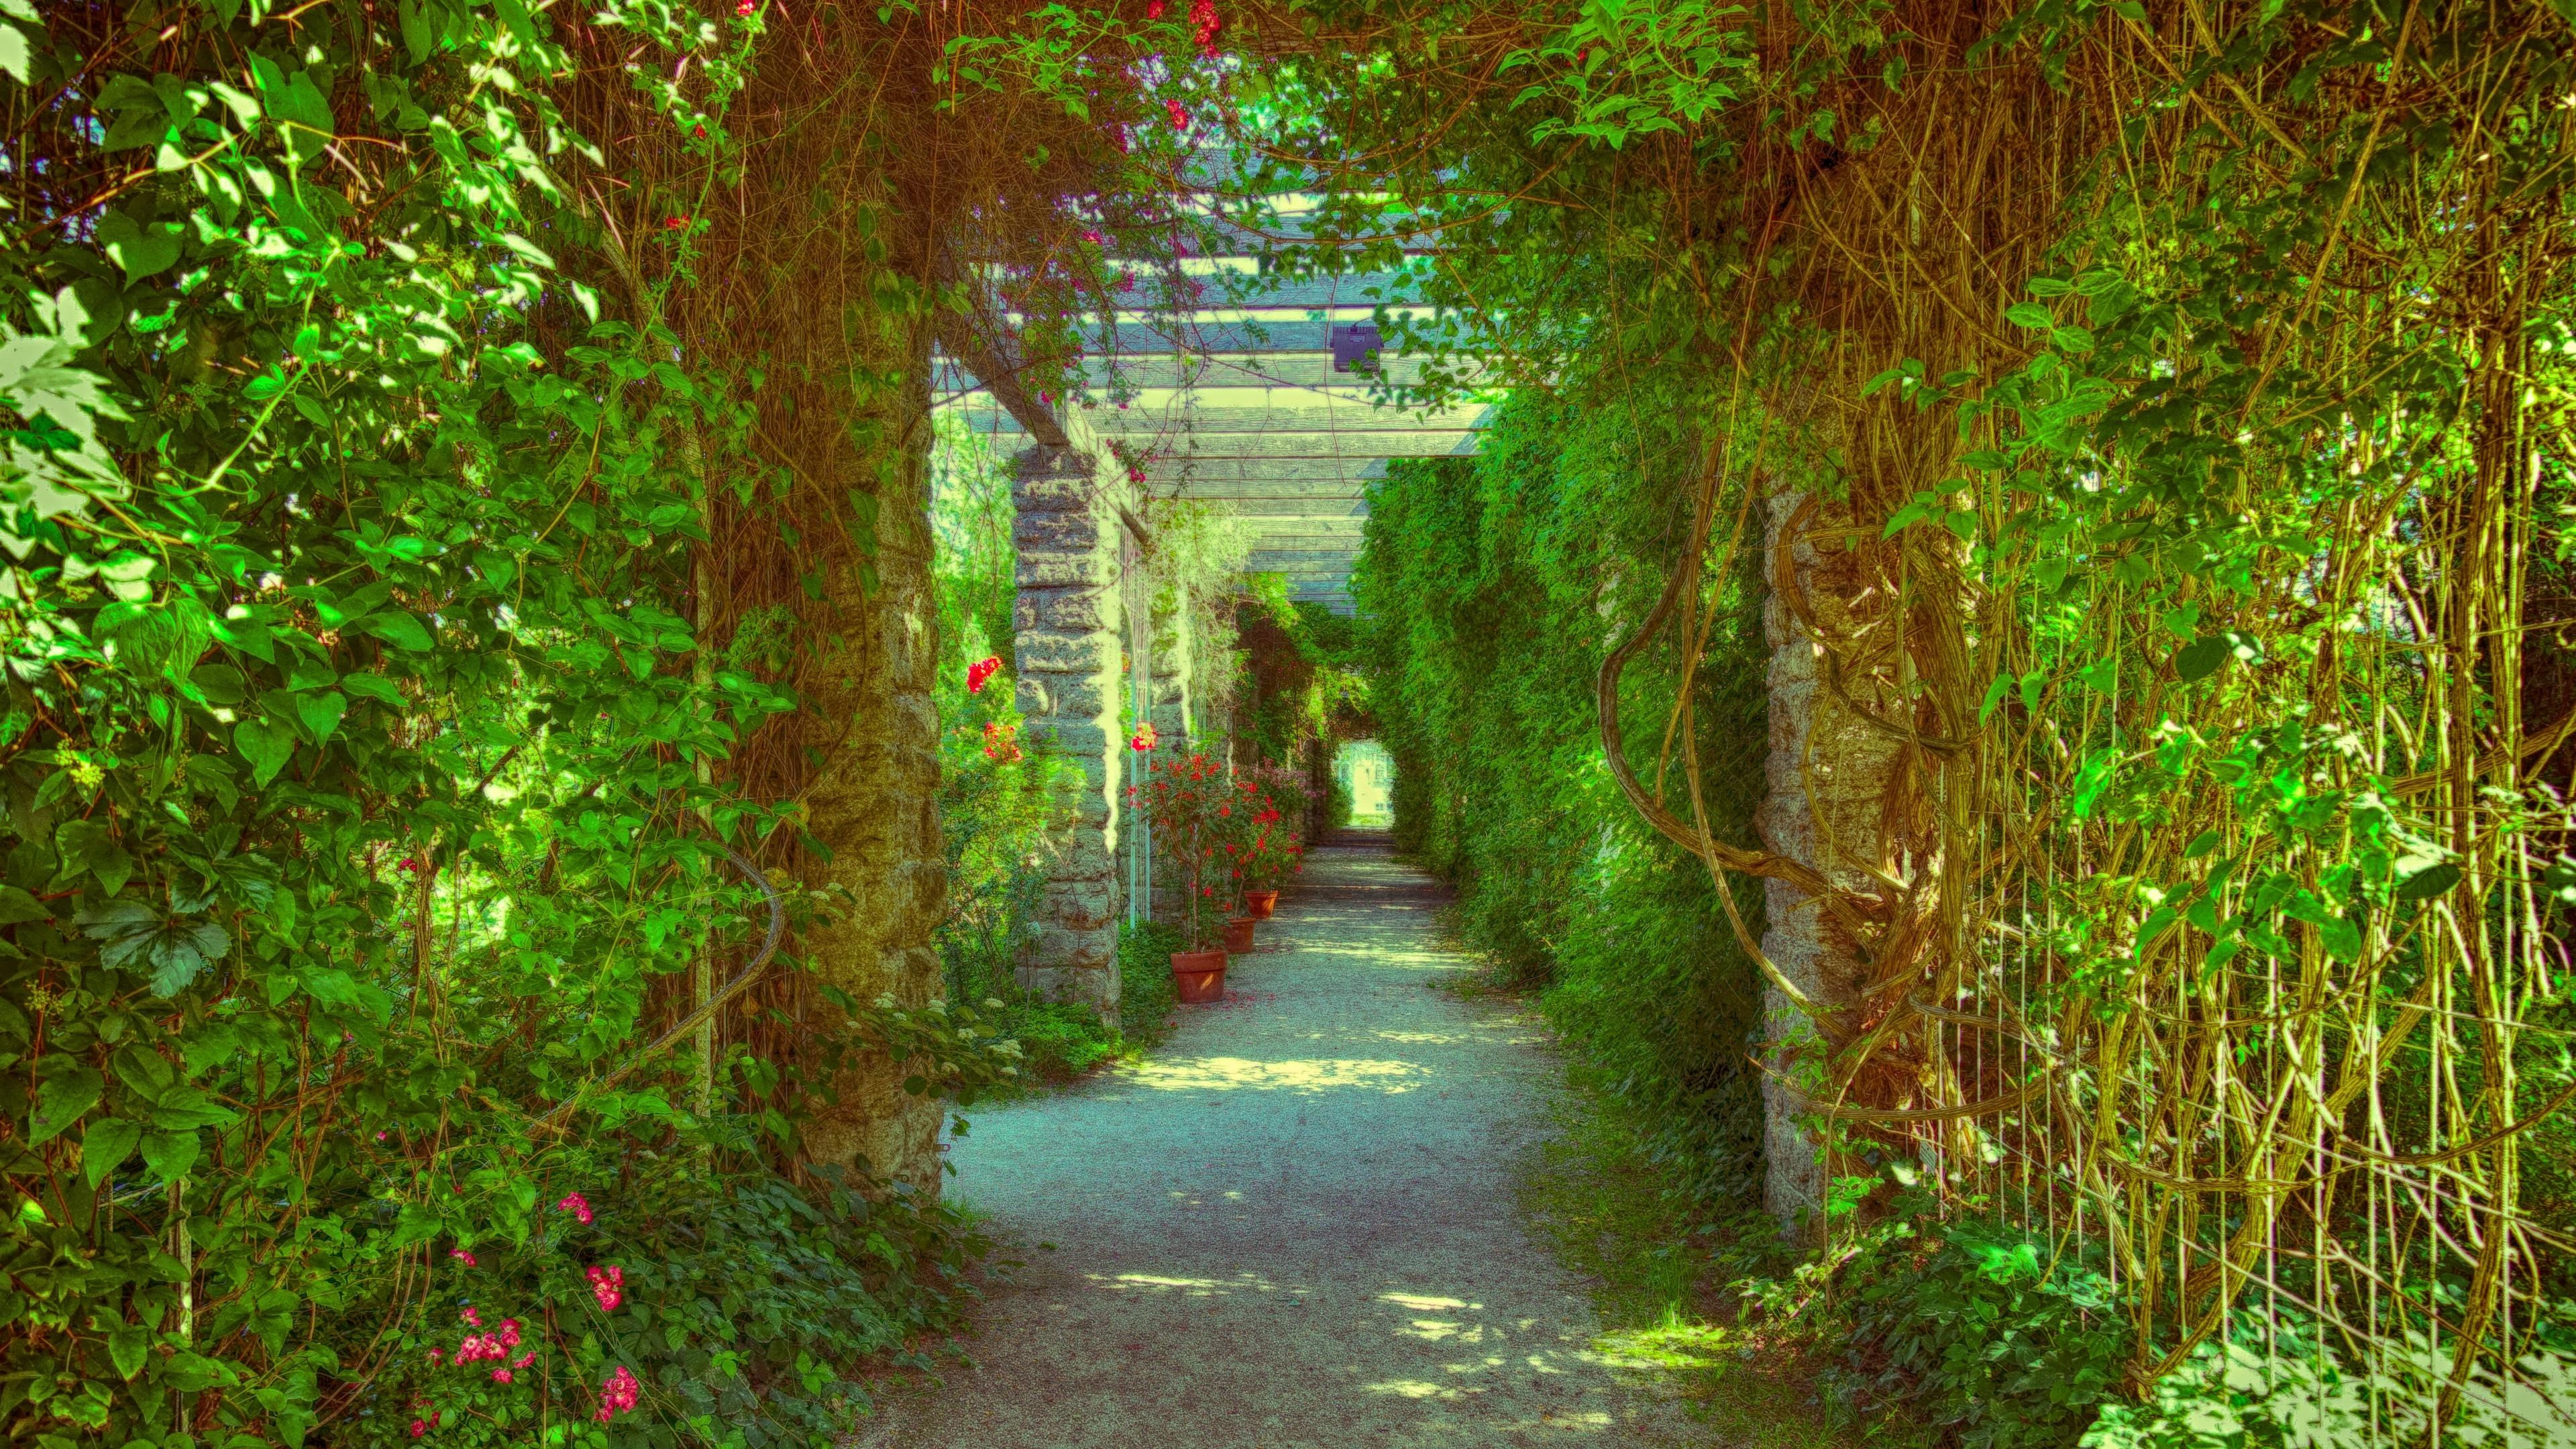 passage overgrown flowers plant 4k 1541116067 - passage, overgrown, flowers, plant 4k - passage, overgrown, Flowers